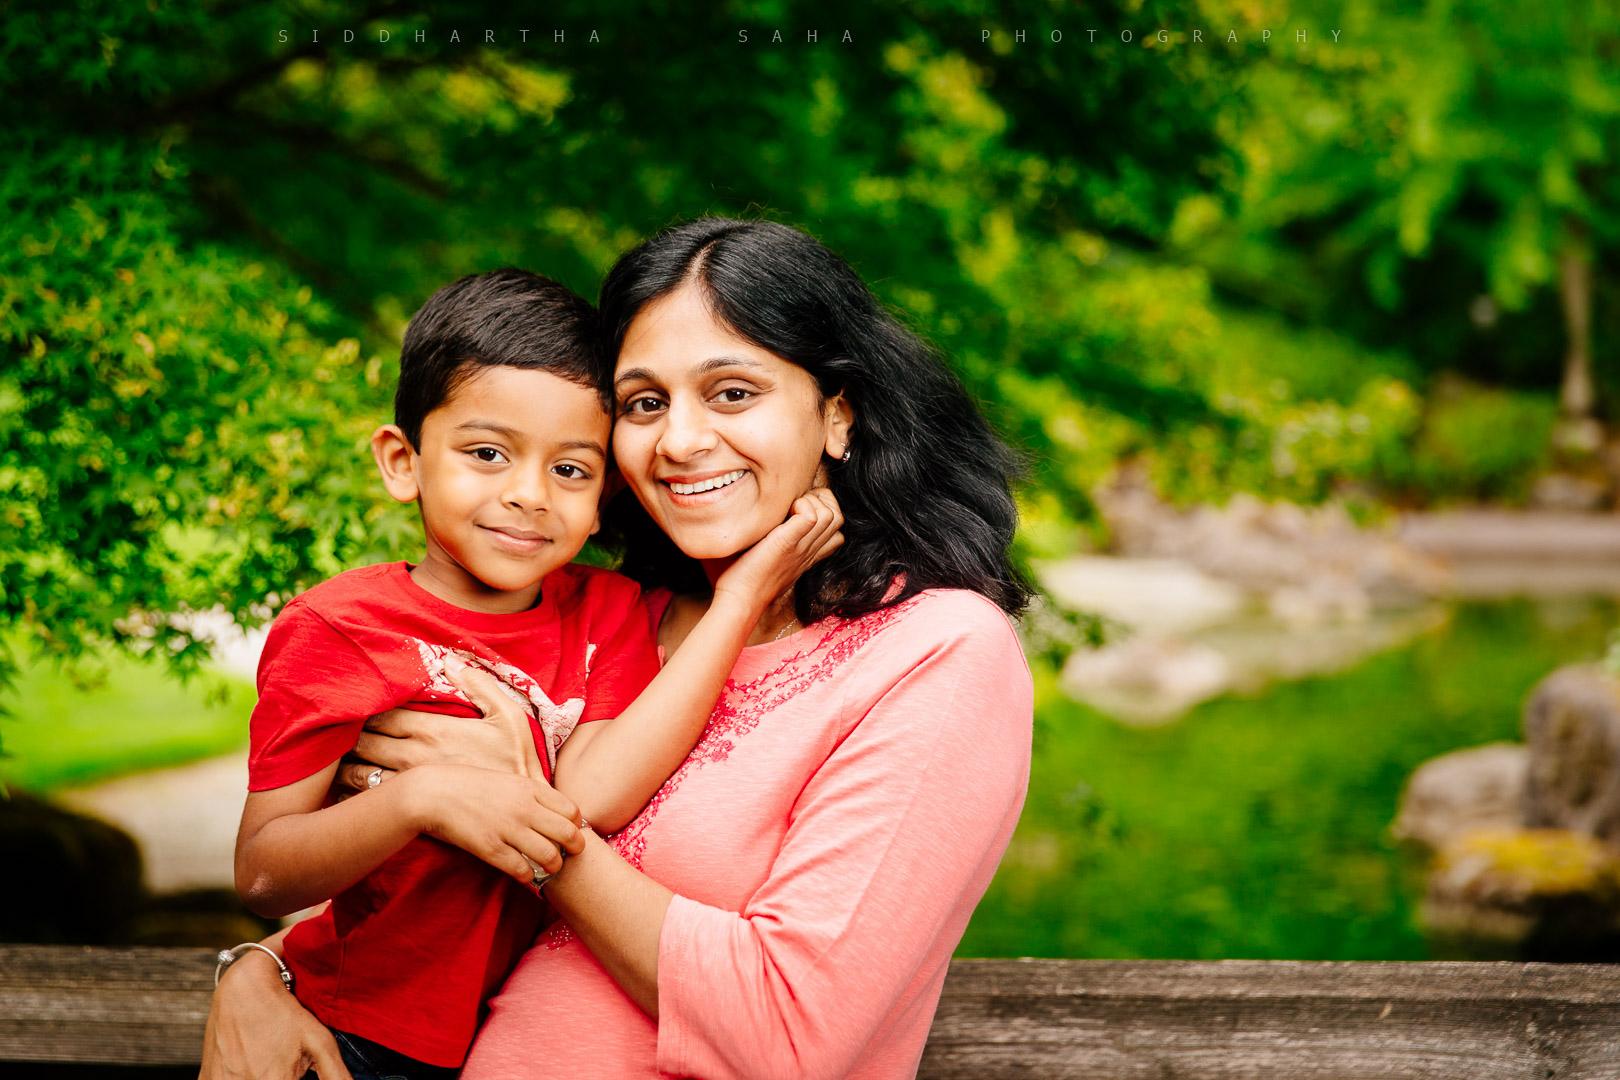 2015-08-08 - Padmaja Ketan Family Photoshoot - _05Y8657